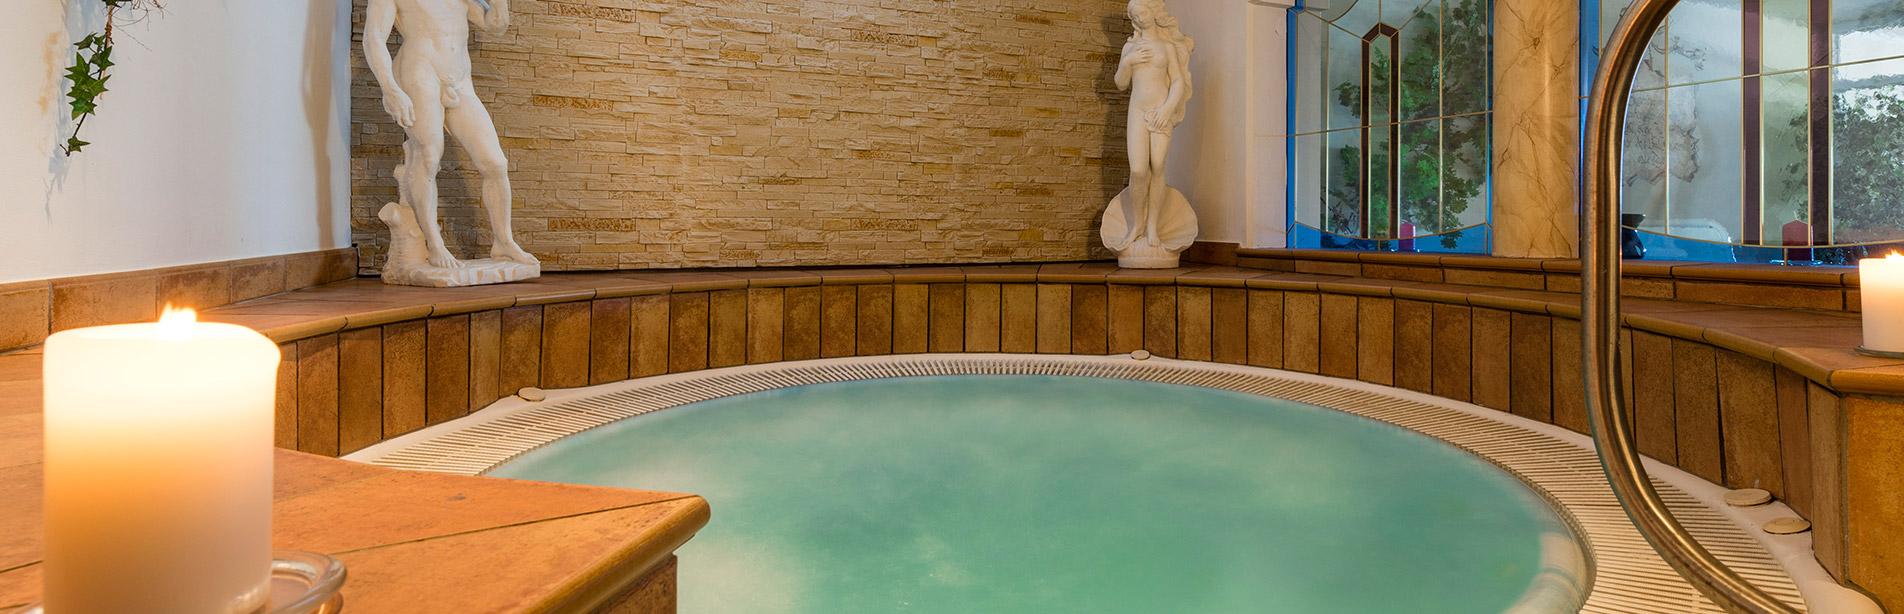 Hotel Sambergerhof whirlpool-2